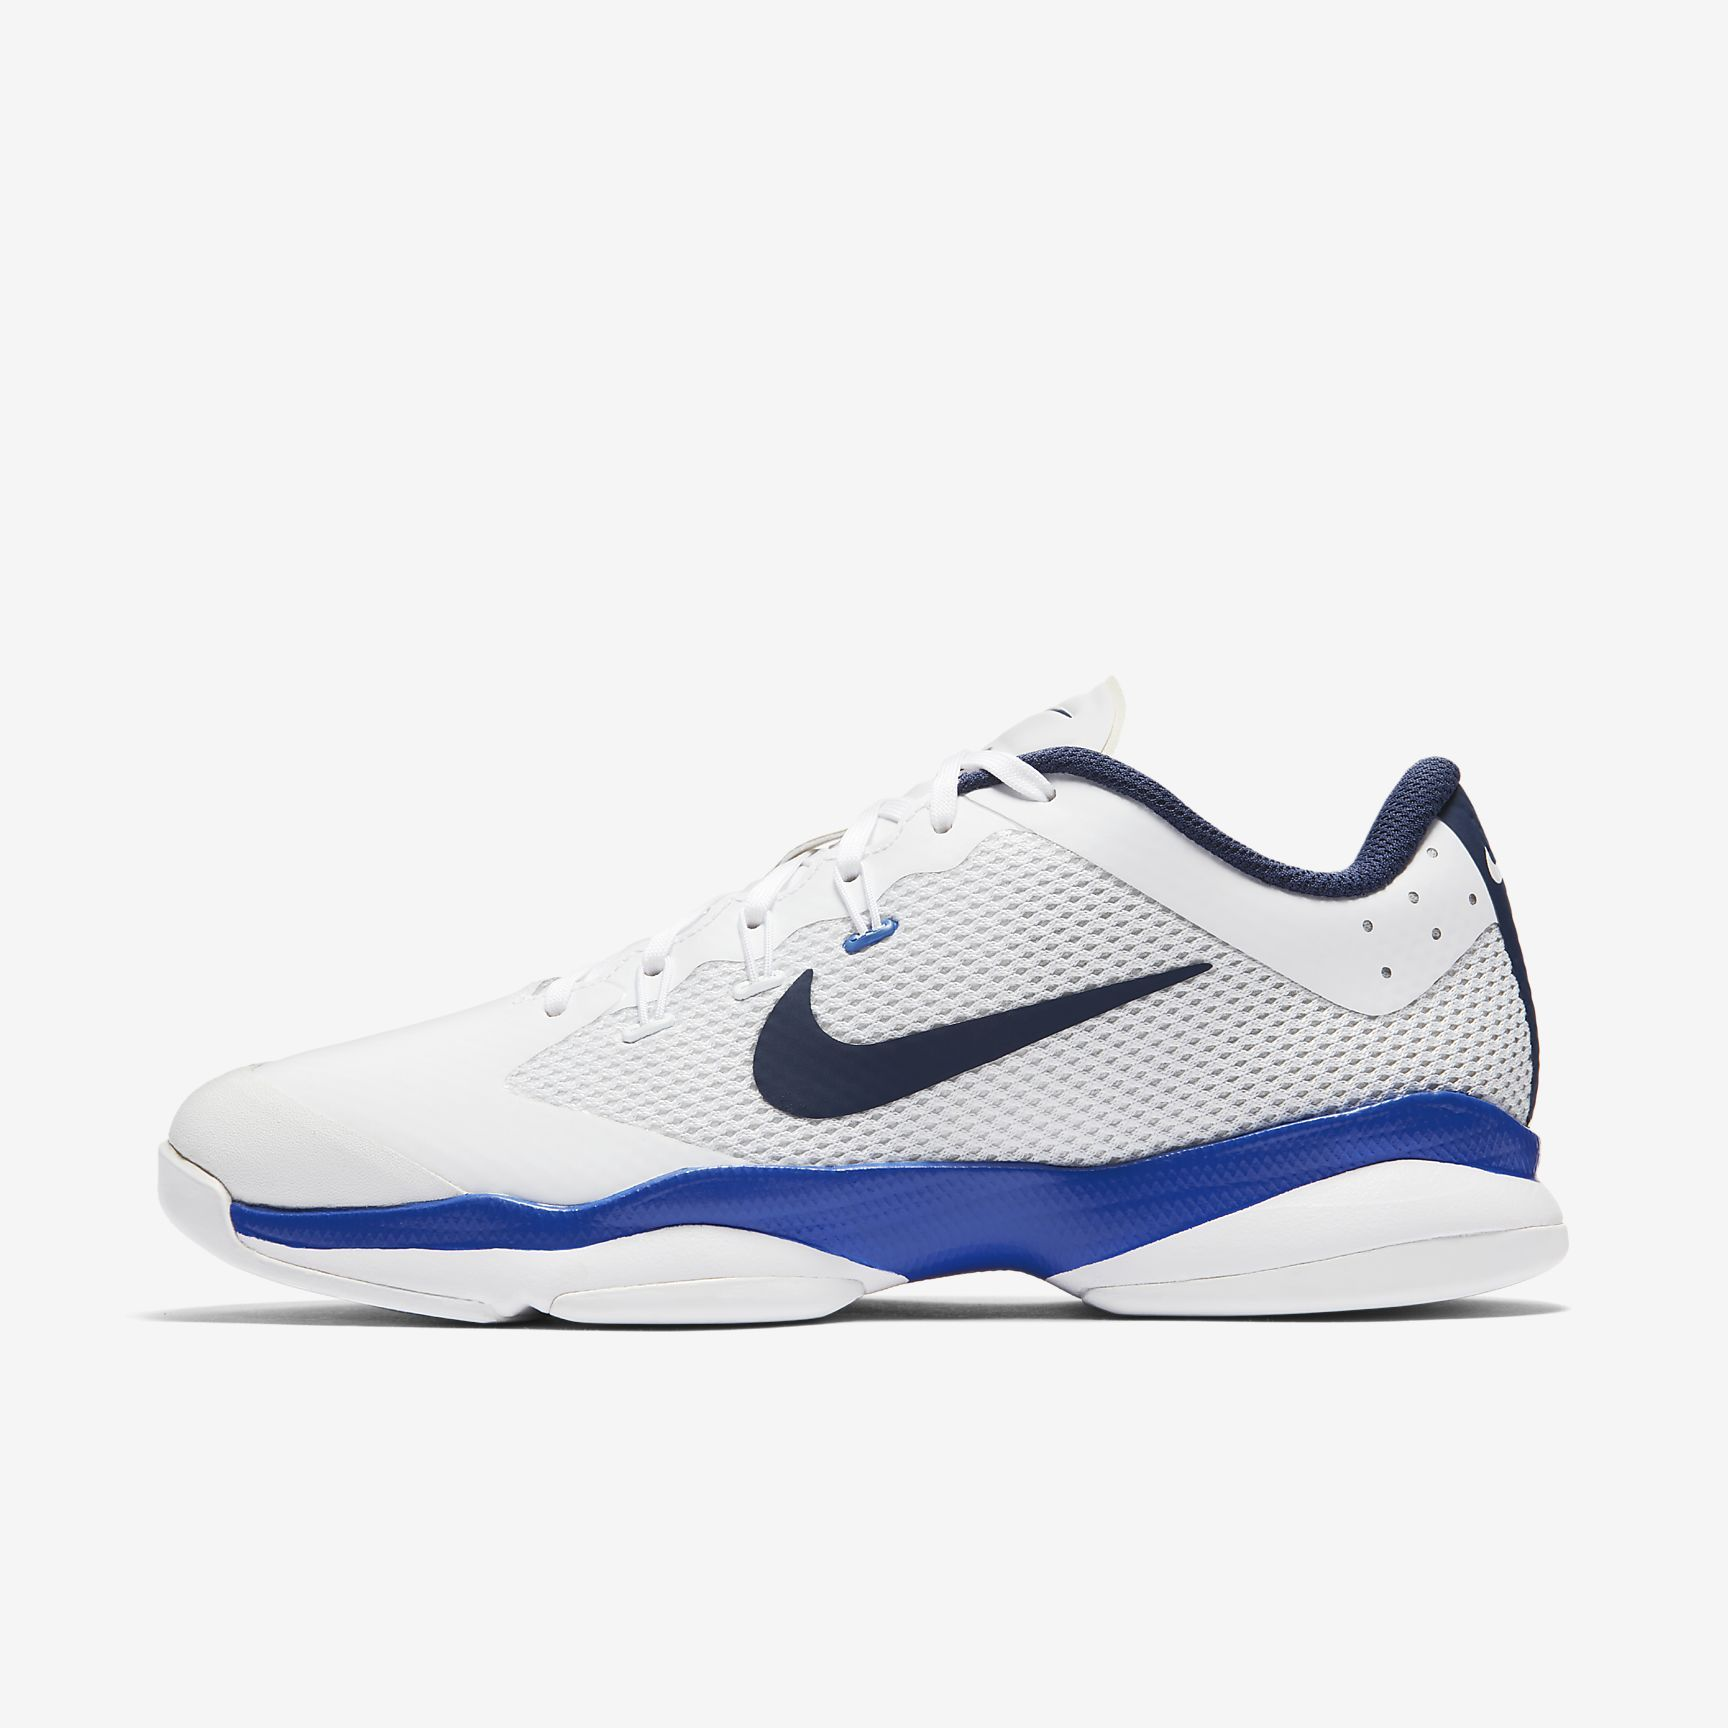 official photos 76773 d3d06 NikeCourt Air Zoom Ultra Carpet Women's Tennis Shoe   Sneakers